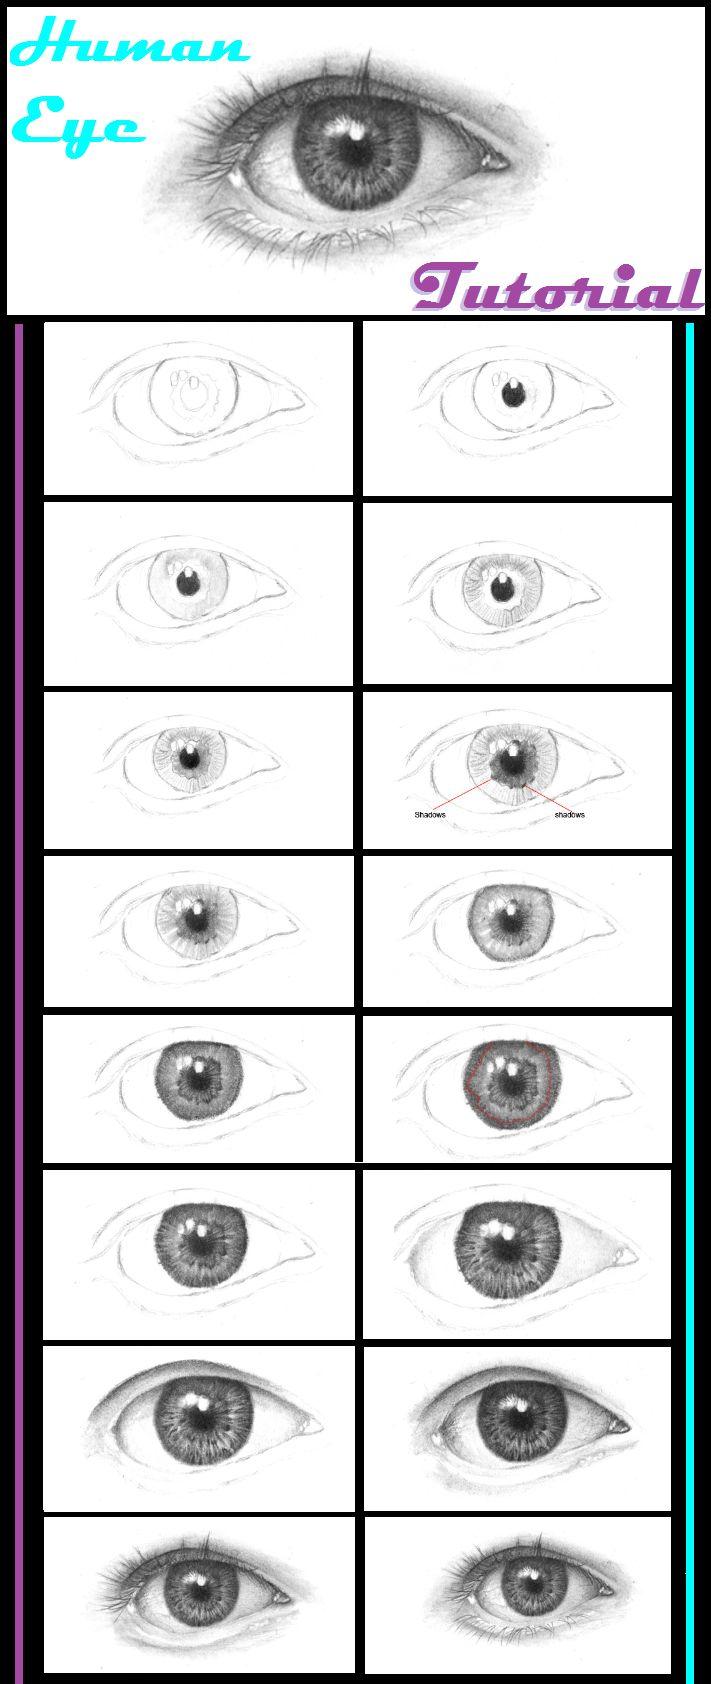 How To Draw A Human Eye #human_eye_tutorial